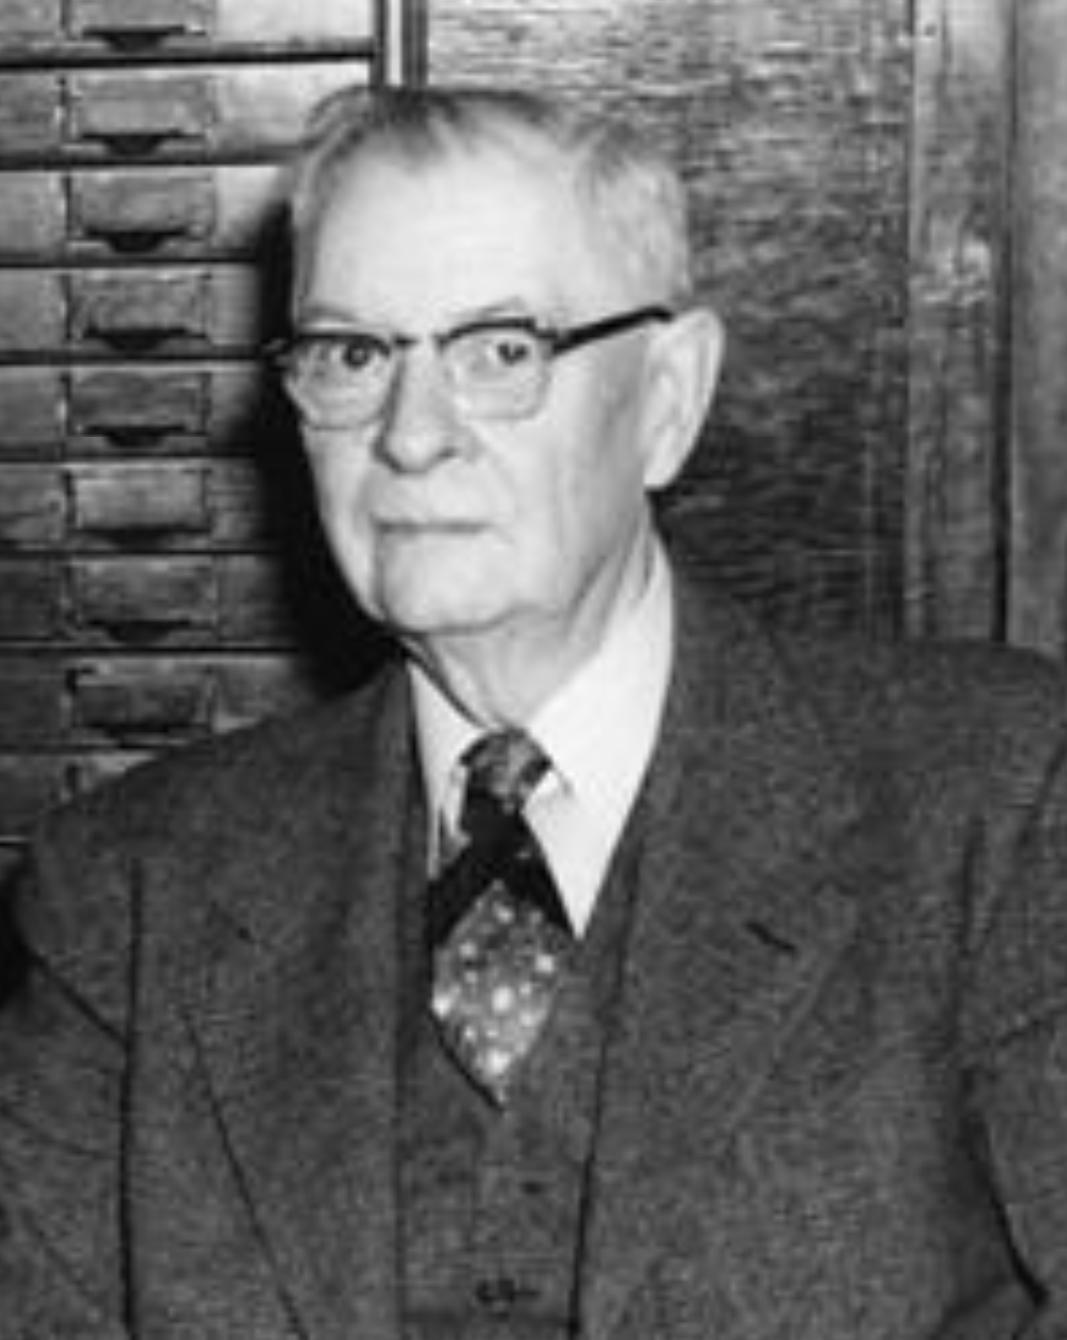 JUDGE RALPH B. RALSTON